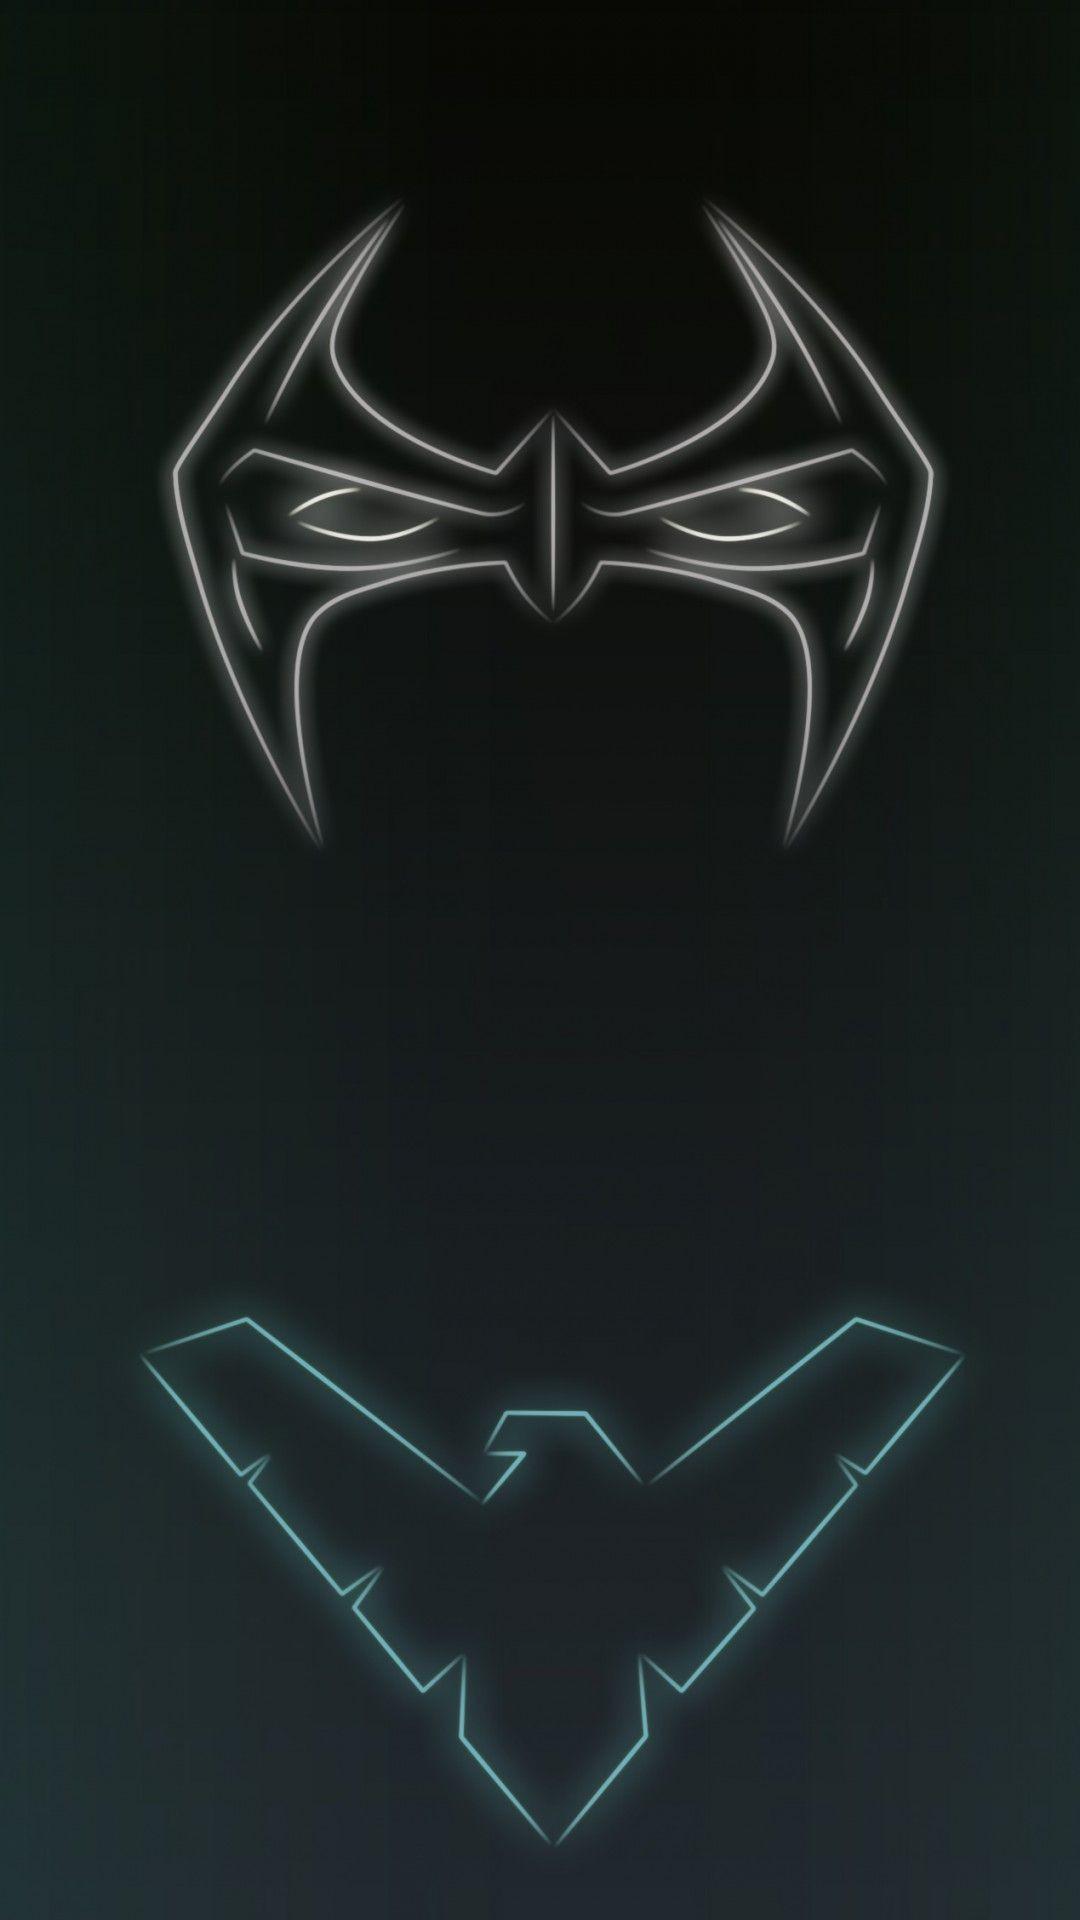 Res: 1080x1920, Download Neon Light Nightwing 1080 x 1920 Wallpapers - 4644301 - neon light  superhero comics dccomics nightwing night wing | mobile9